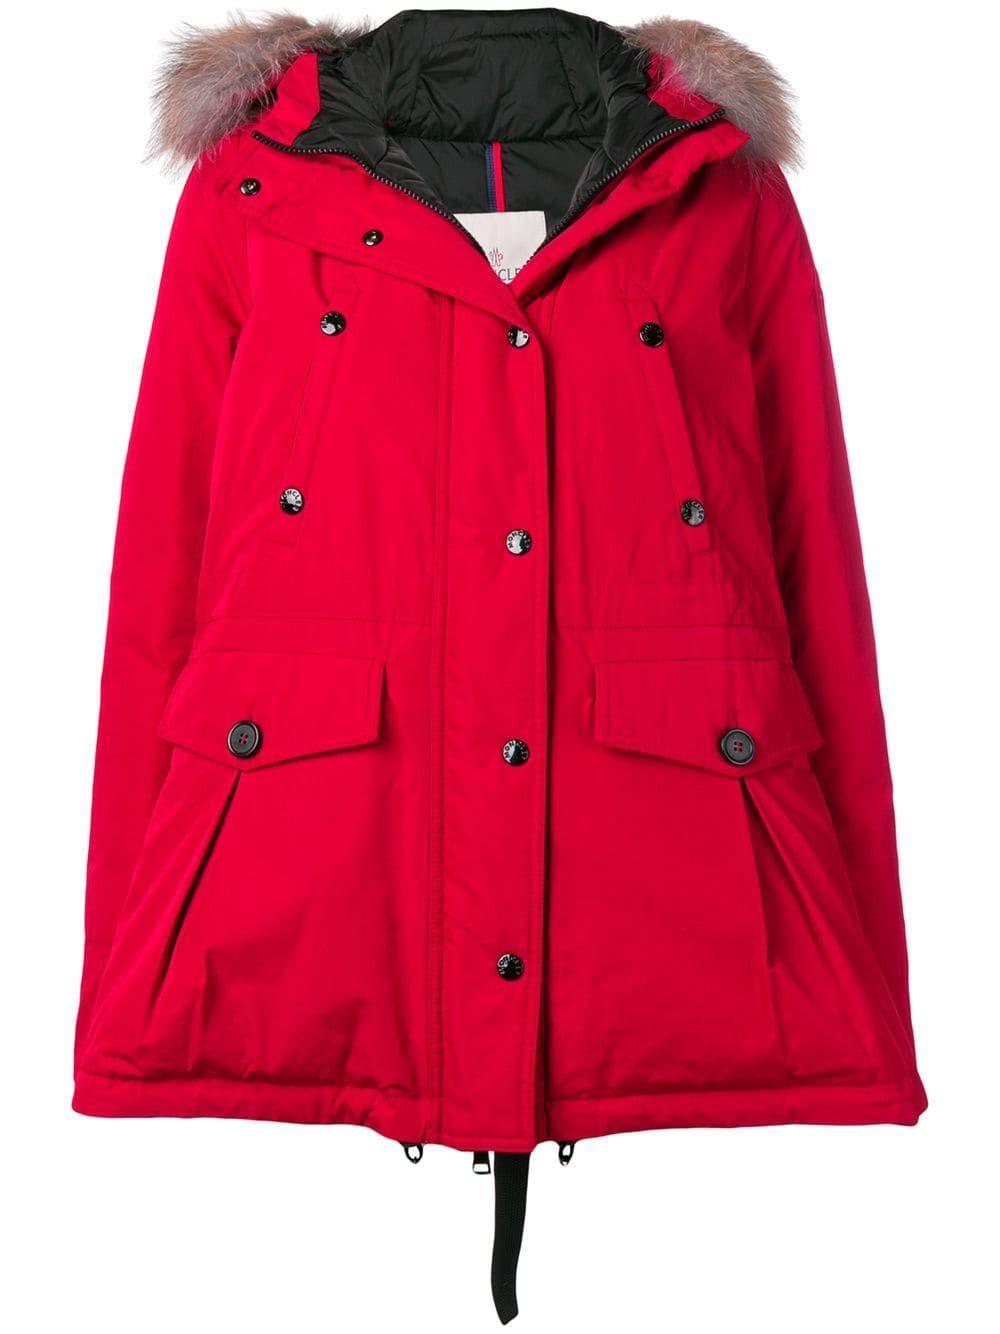 9bc0de6fa Moncler short parka - Red in 2019   Products   Moncler, Parka, Jackets